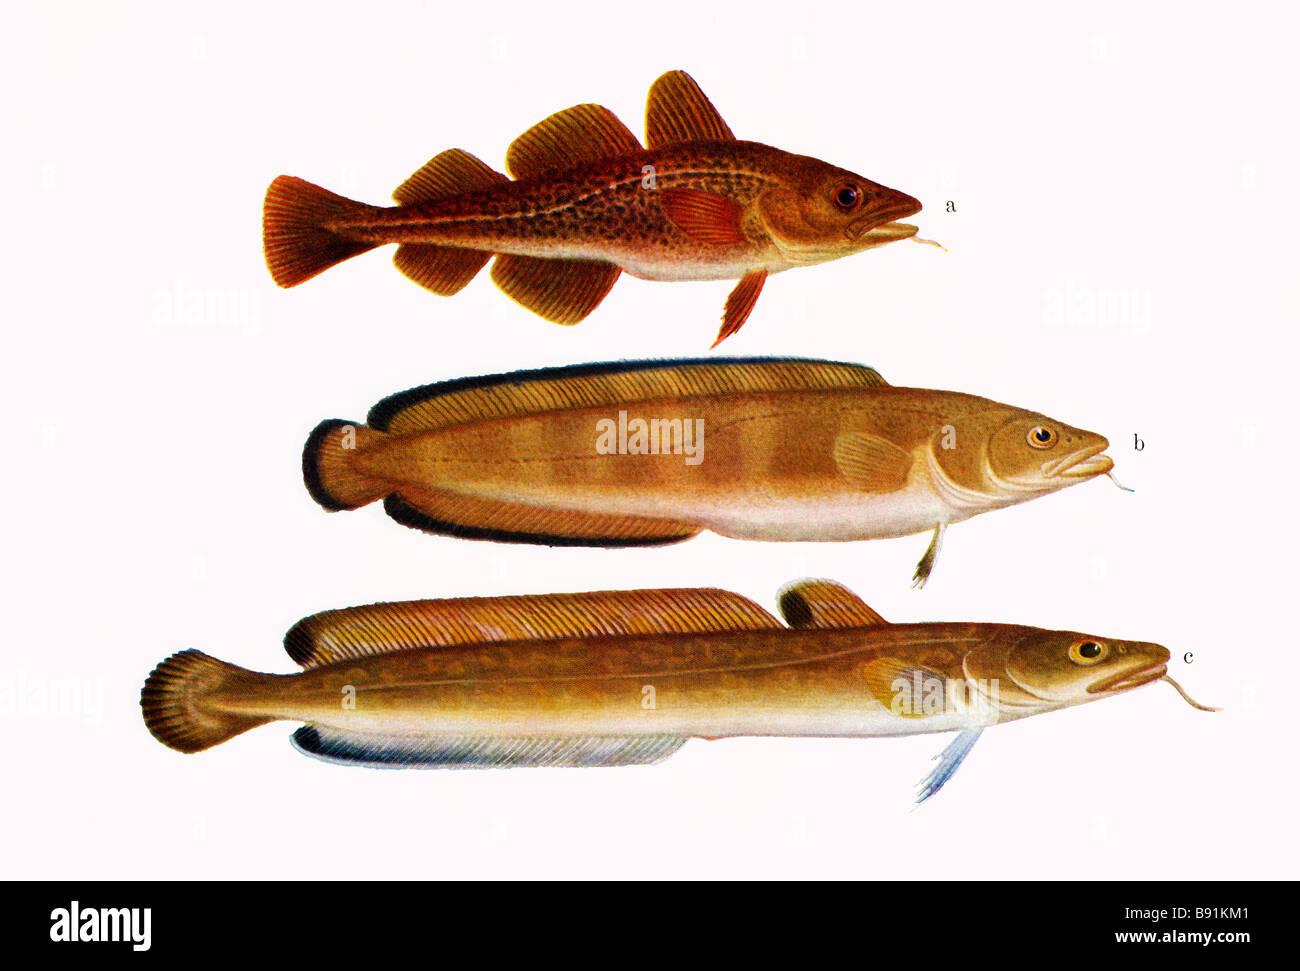 (a) Cod, Gadus ogac (b) The cusk or tusk, Brosme brosme and (c)  common ling, molva, 19th century art by O Gylling Stock Photo